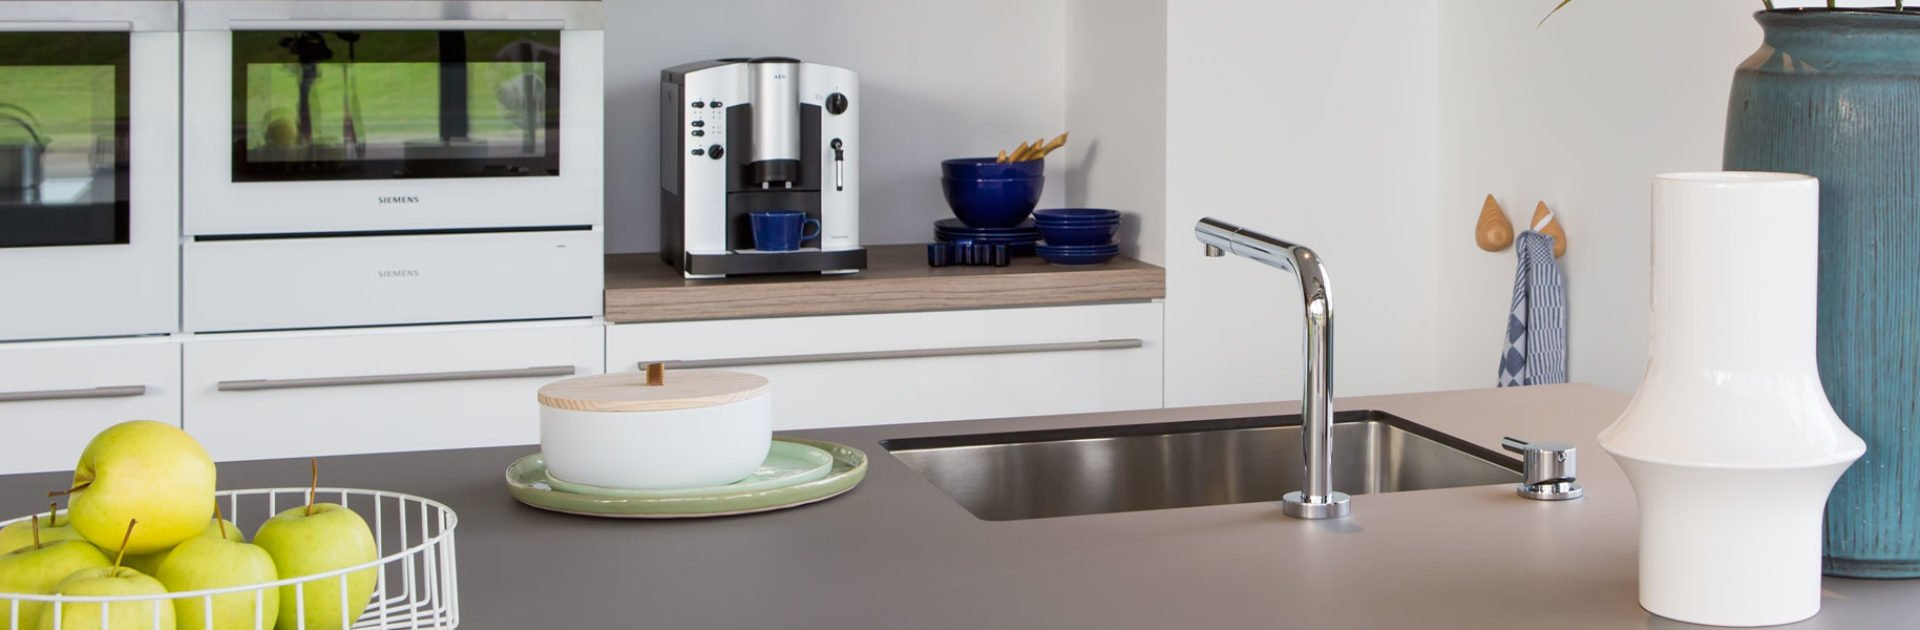 Servicemelding   Satink Keukens & Badkamers